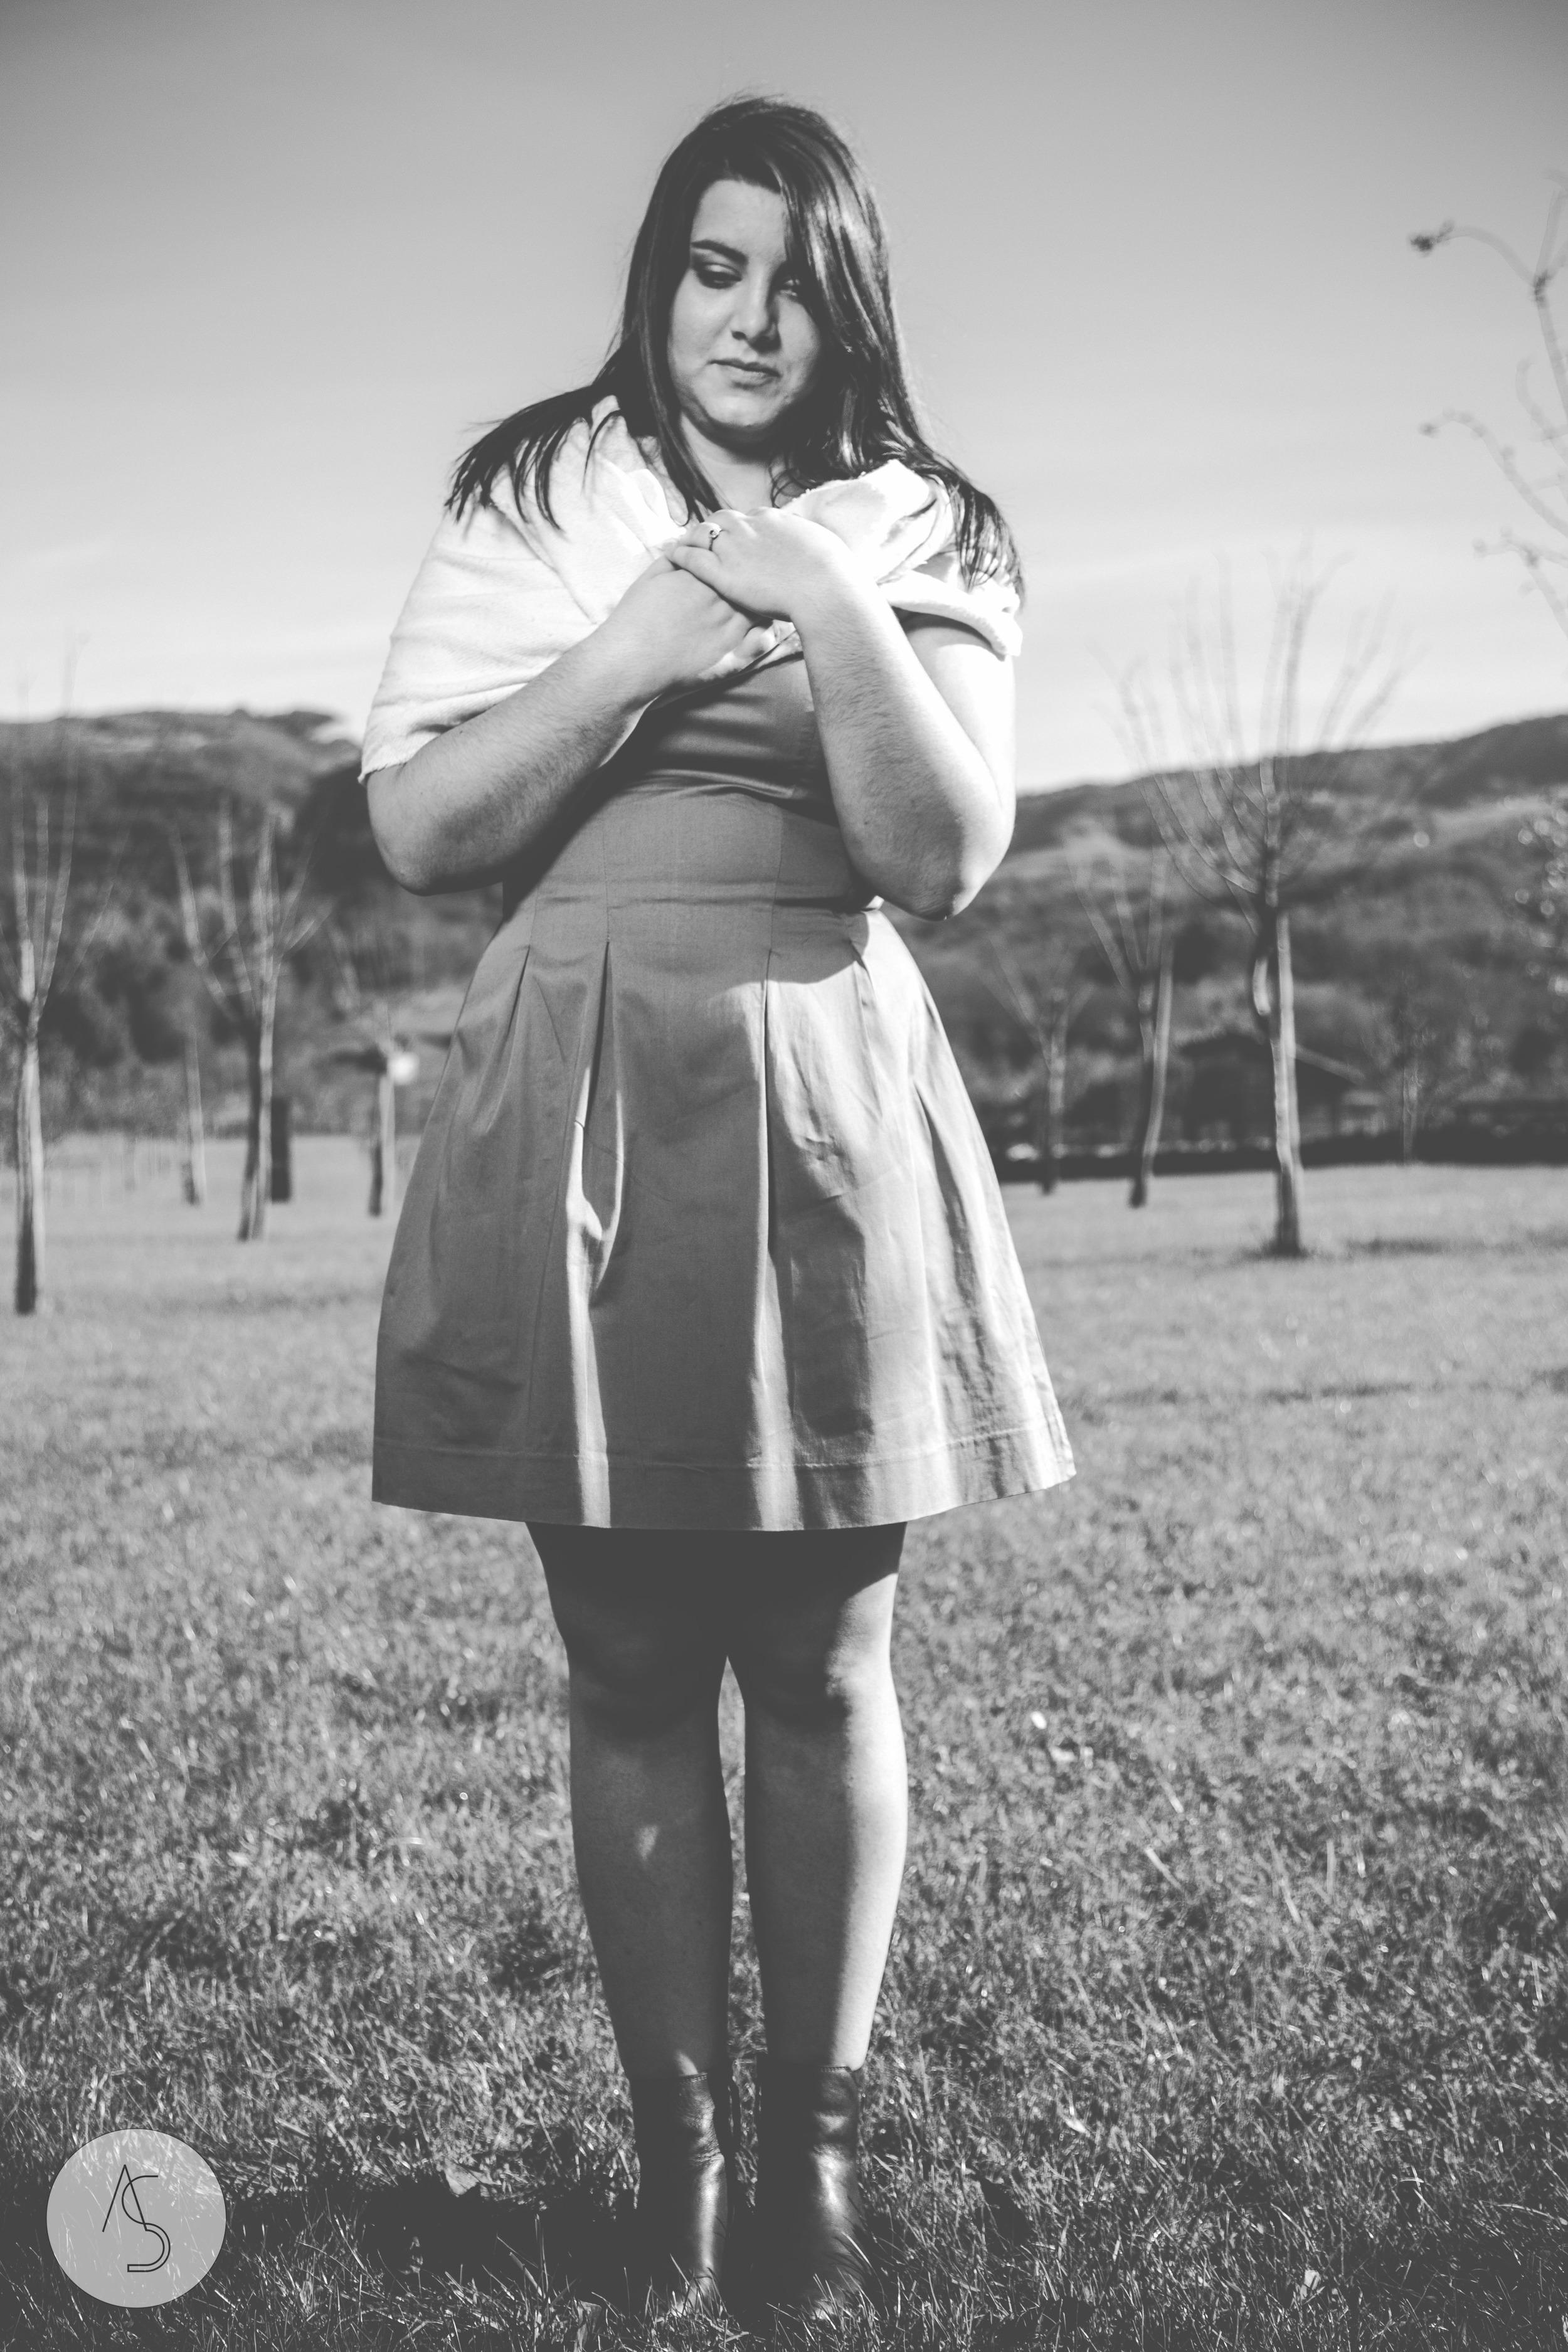 Photographe Mariage - Séance engagement - Grenoble - Rhone Alpes - Adriana Salazar photo-16.jpg